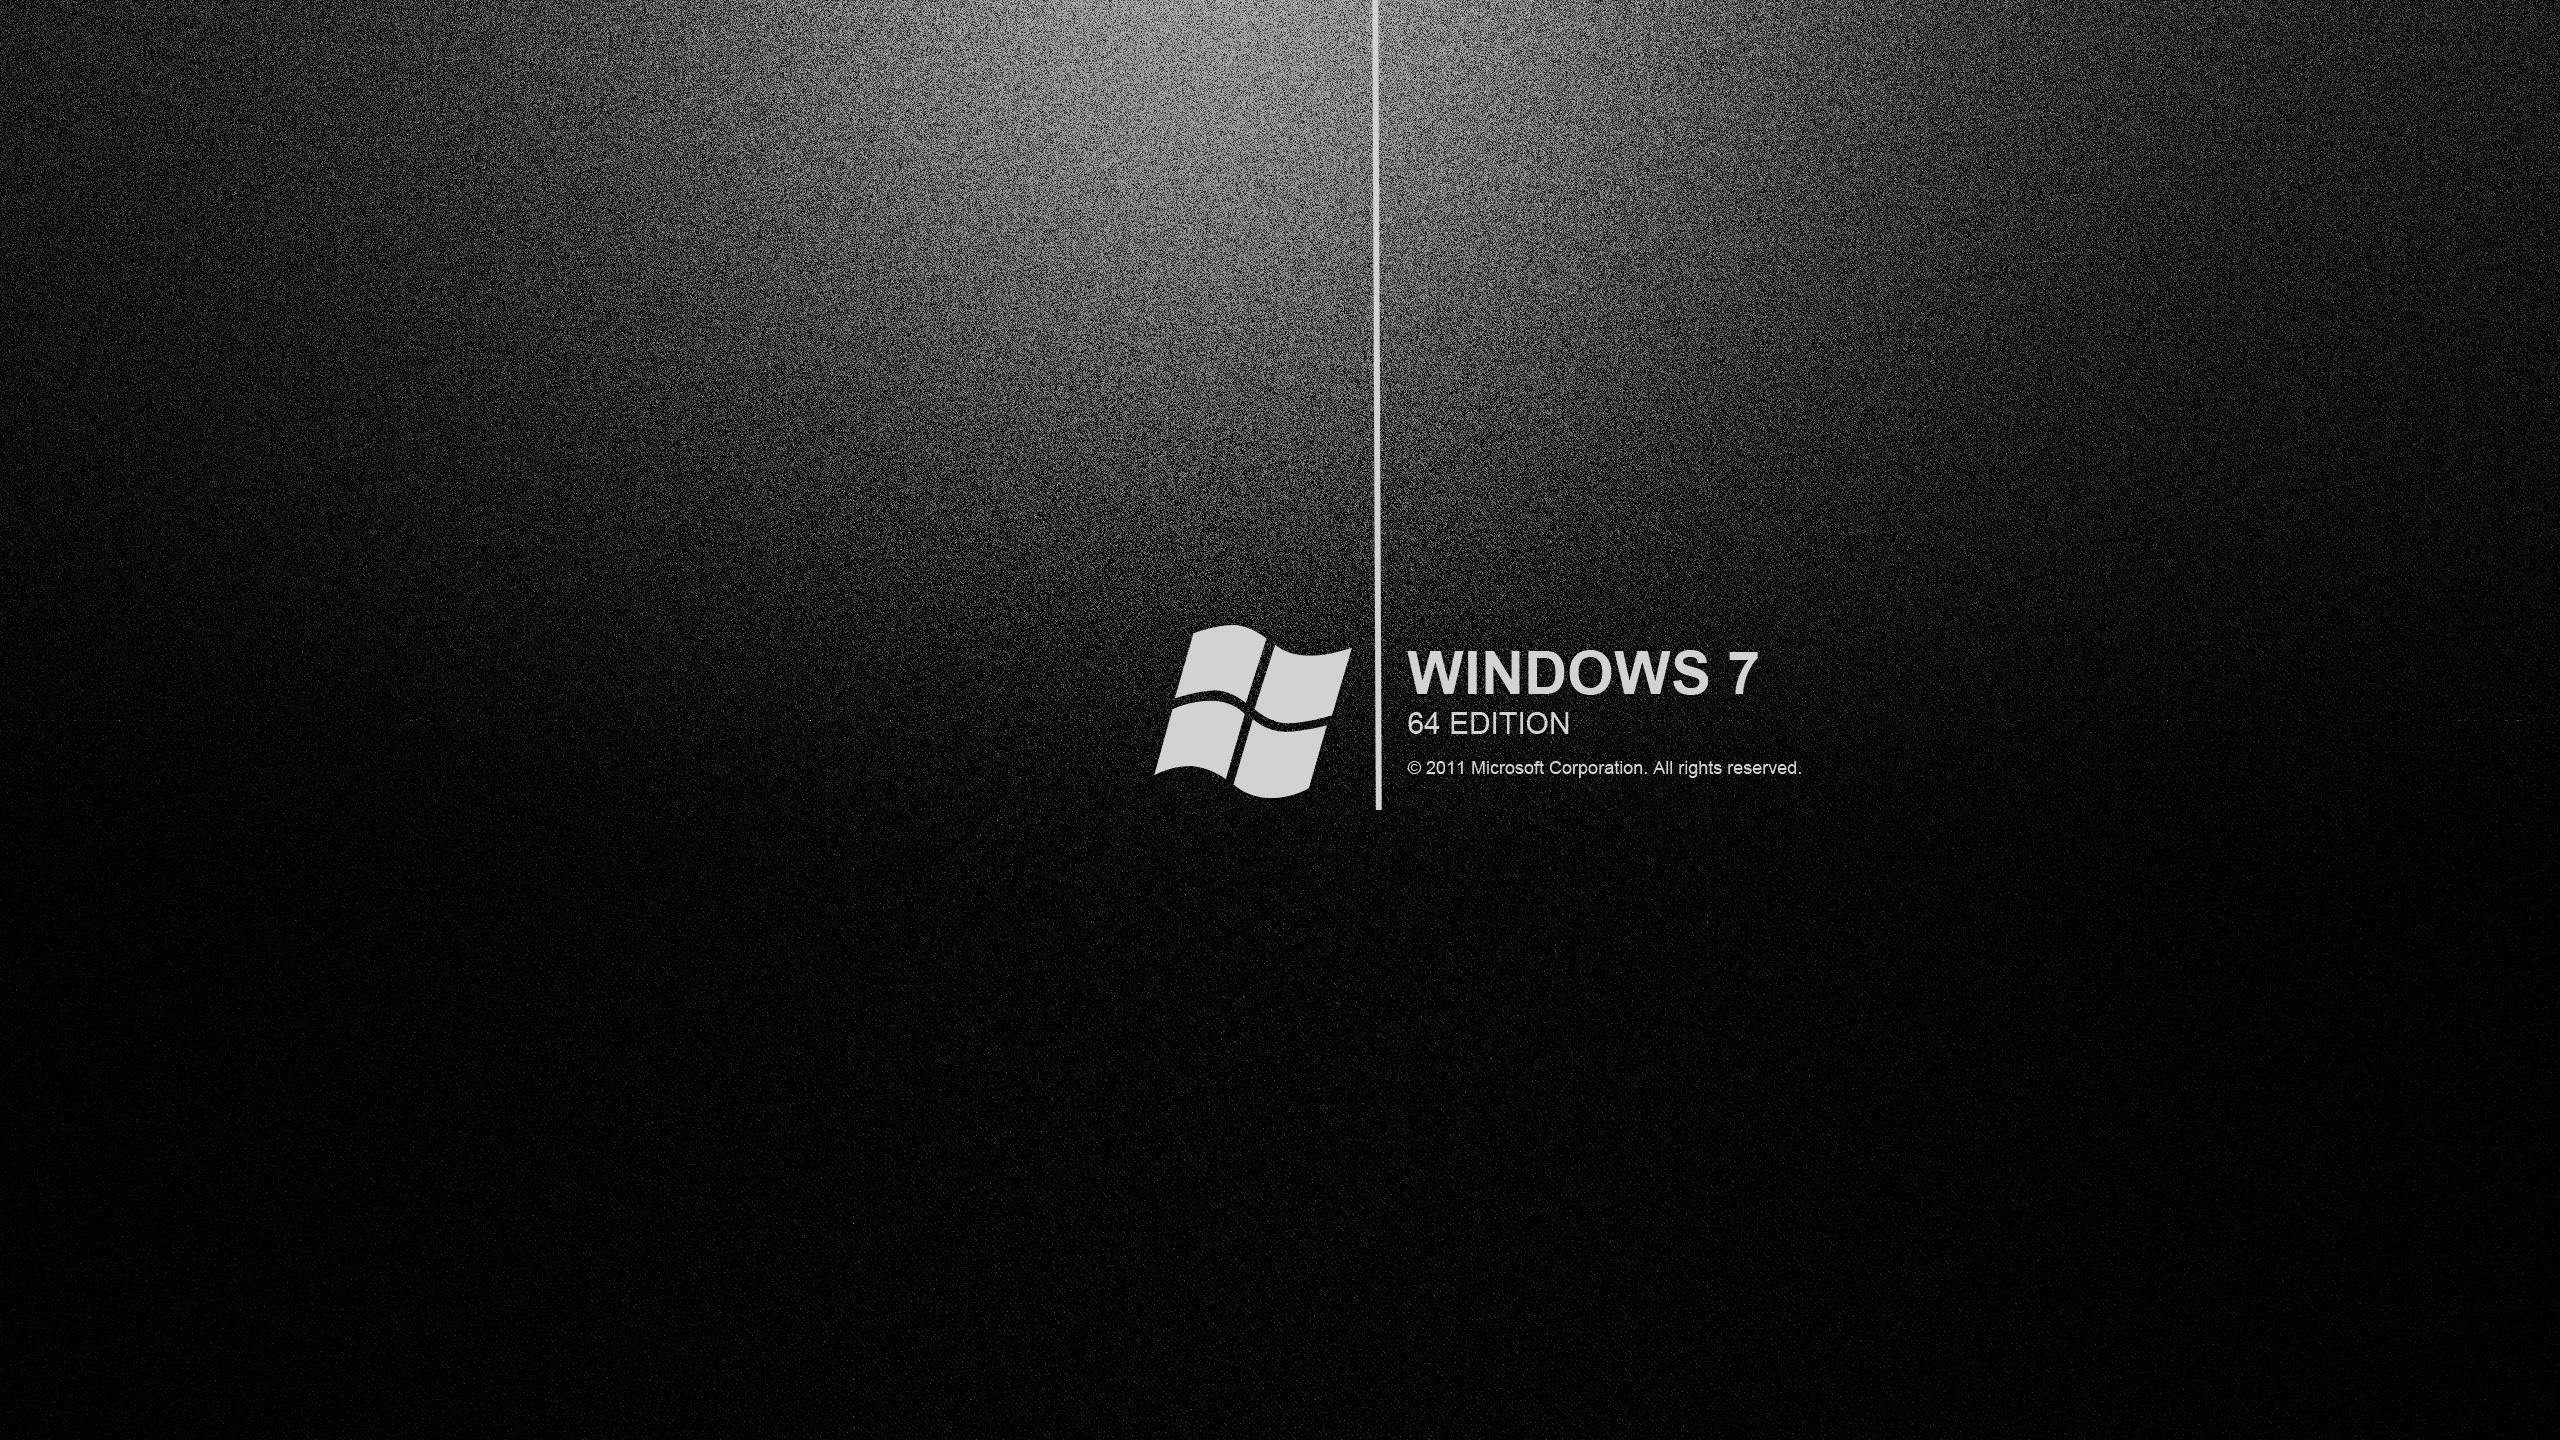 comwindows 7 black wallpapers backgrounds dark hd desktop wallpapers 2560x1440